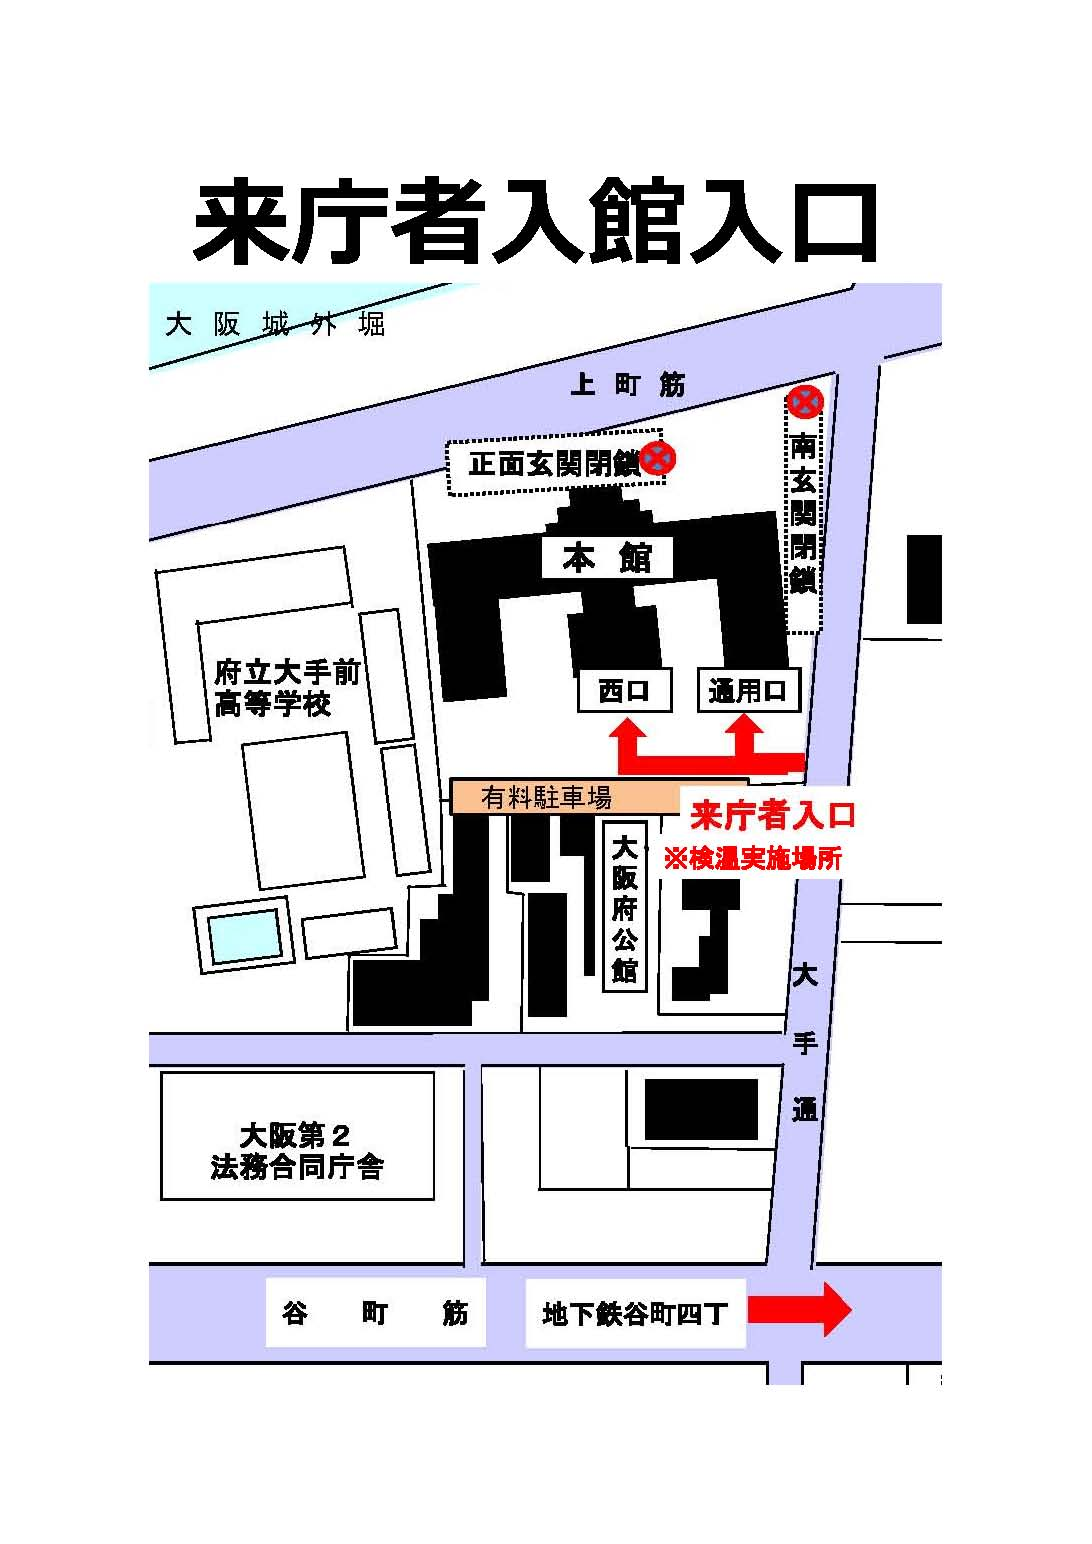 大阪府庁舎本館入館時に検温実施へ(5/11~)